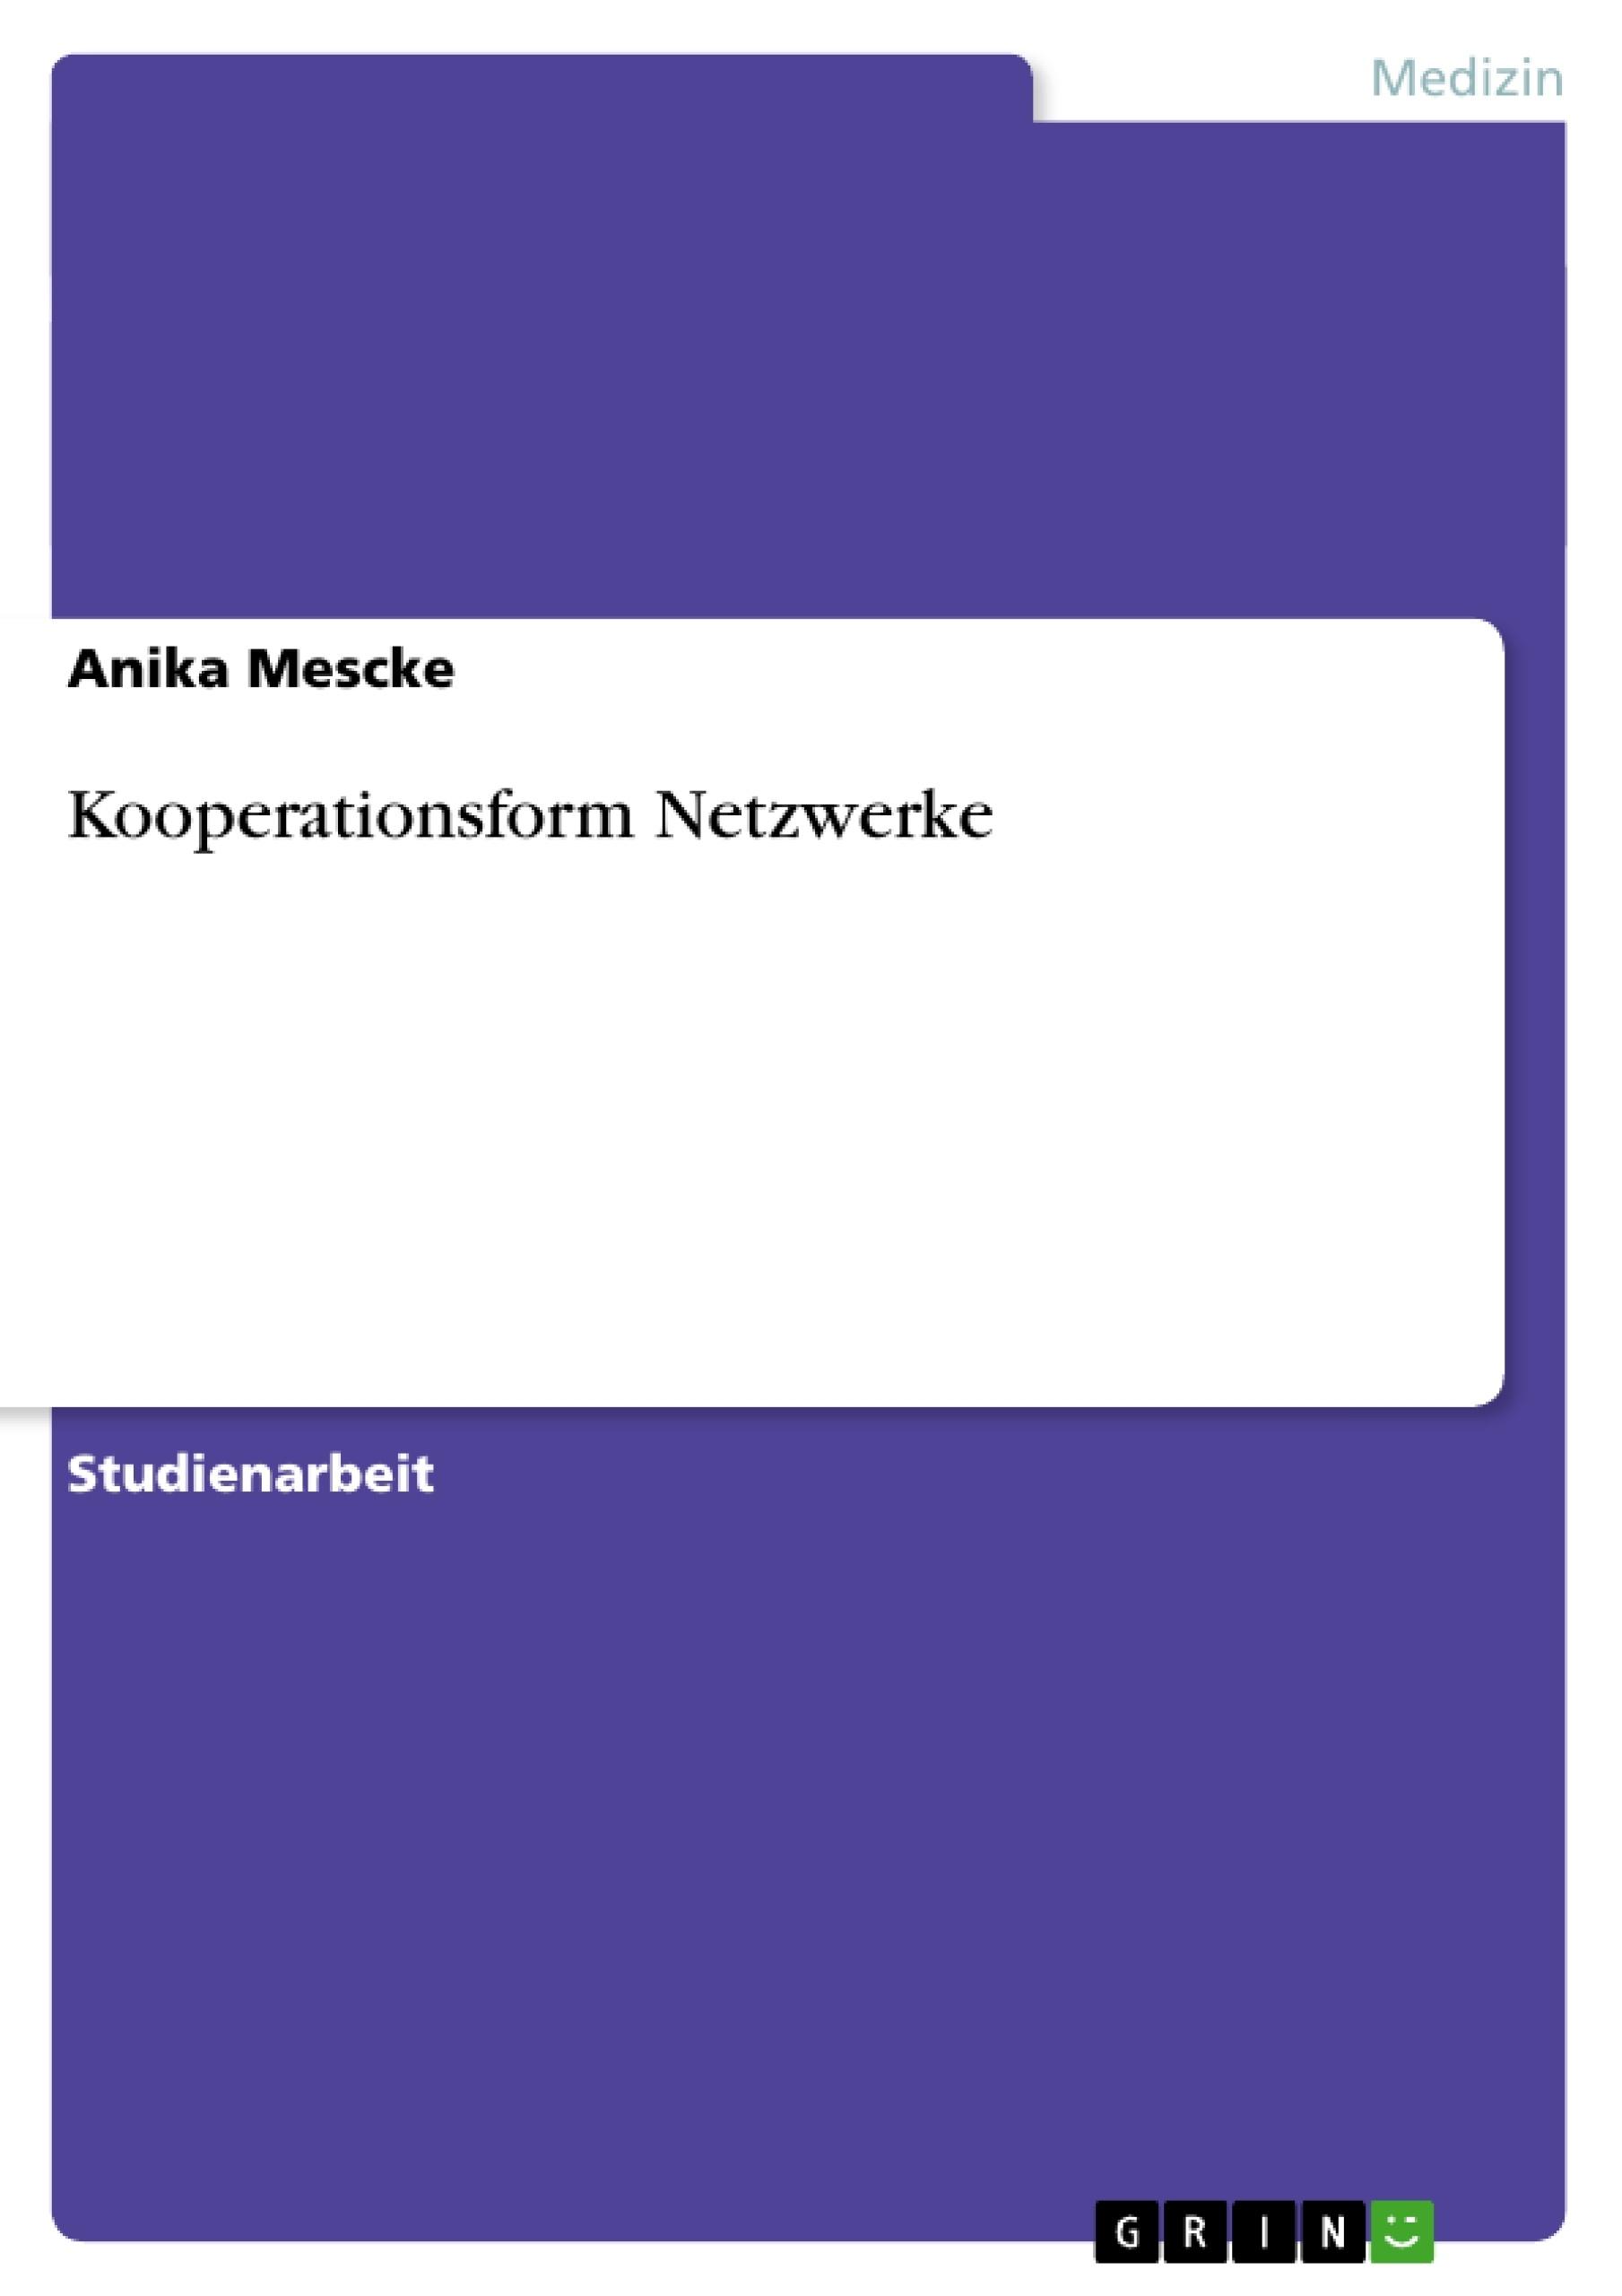 Titel: Kooperationsform Netzwerke